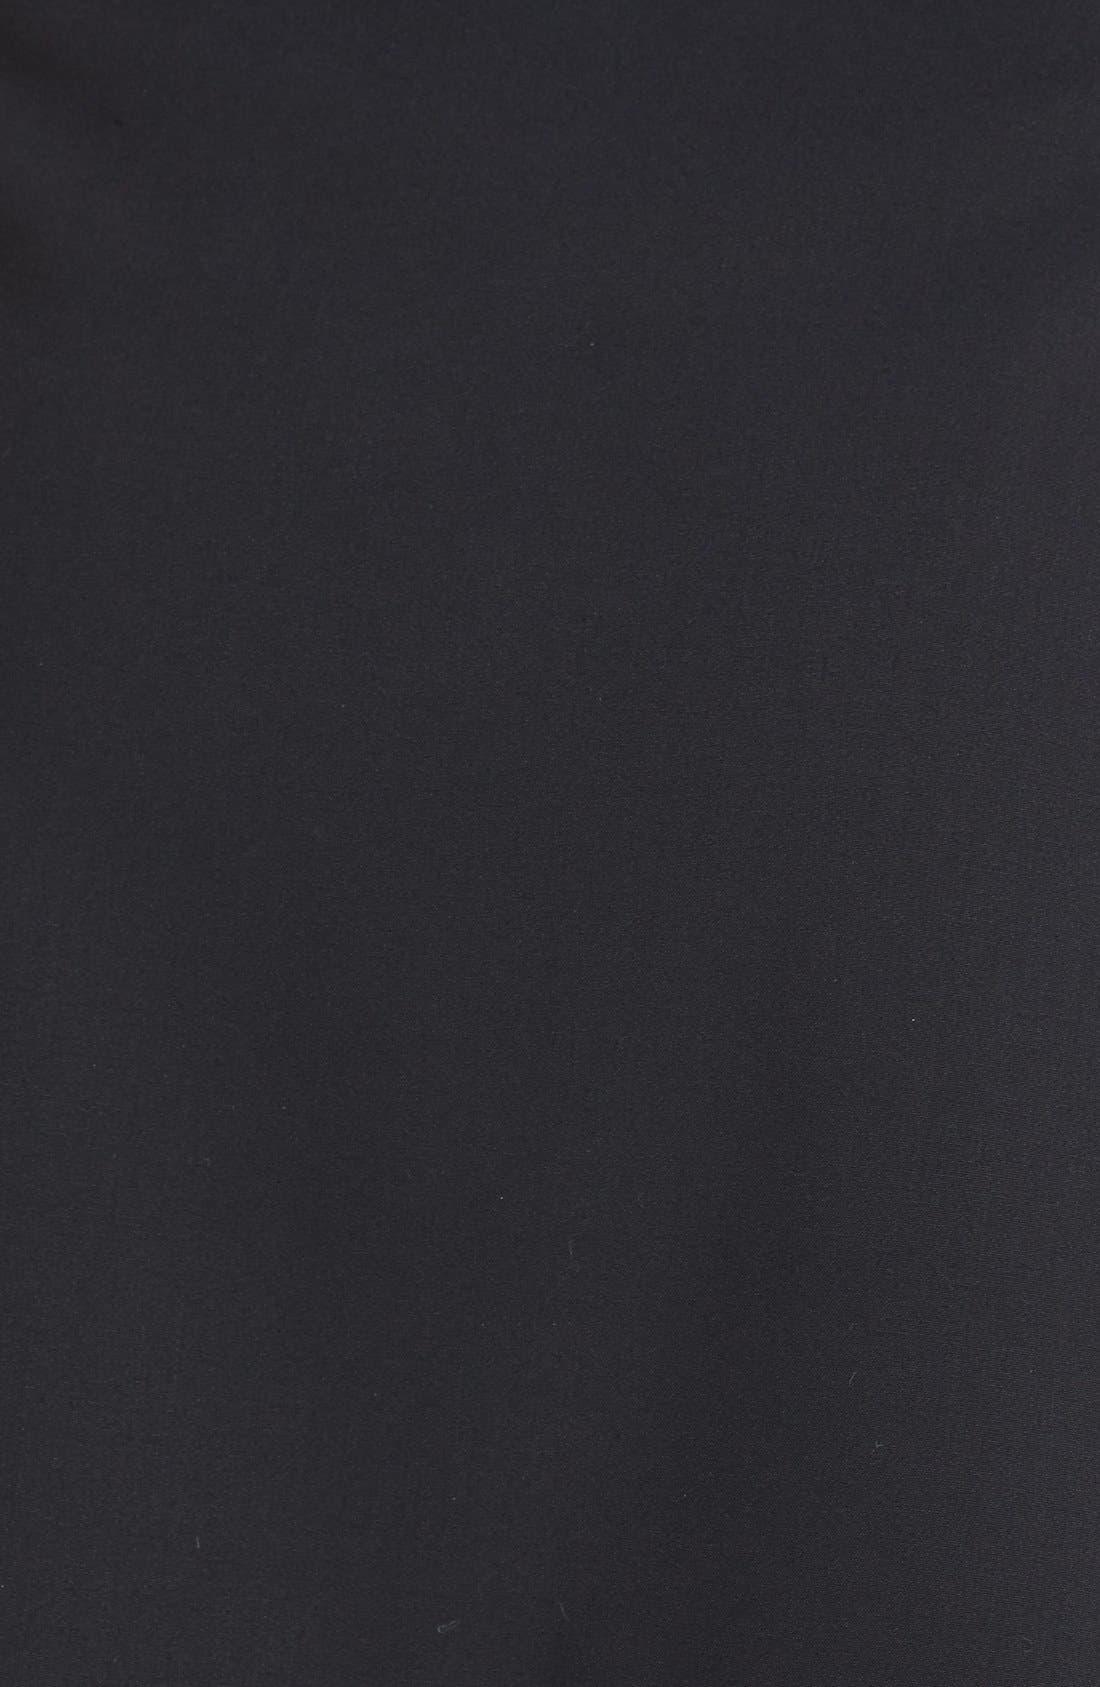 Alternate Image 3  - Vince Camuto Ruffle Hem Skirt (Regular & Petite)